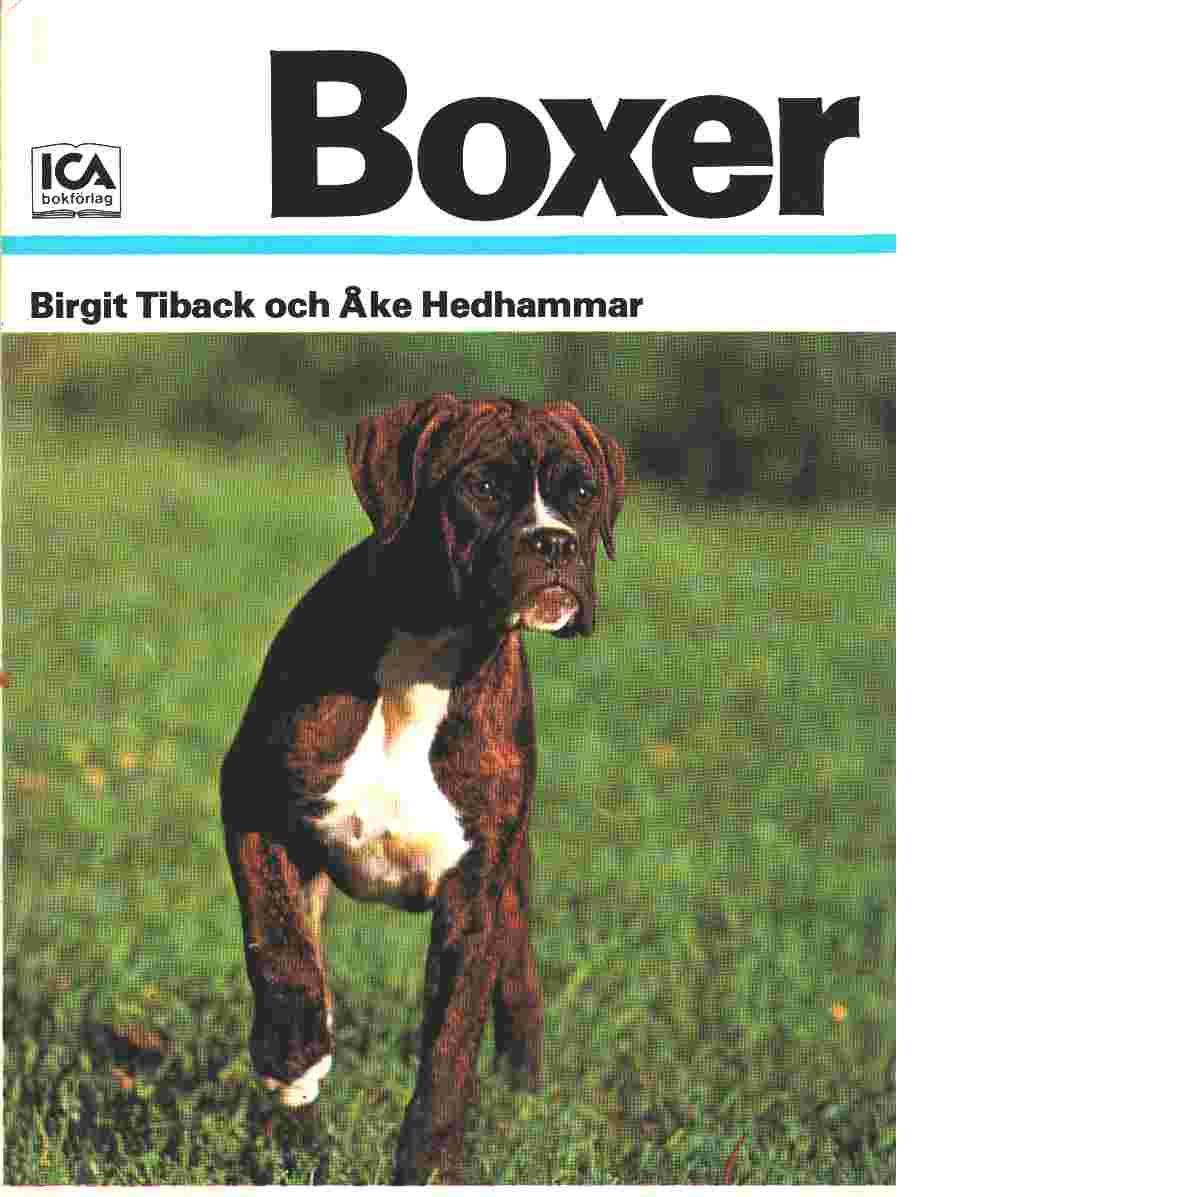 Boxer - Tiback, Birgit och  Hedhammar, Åke